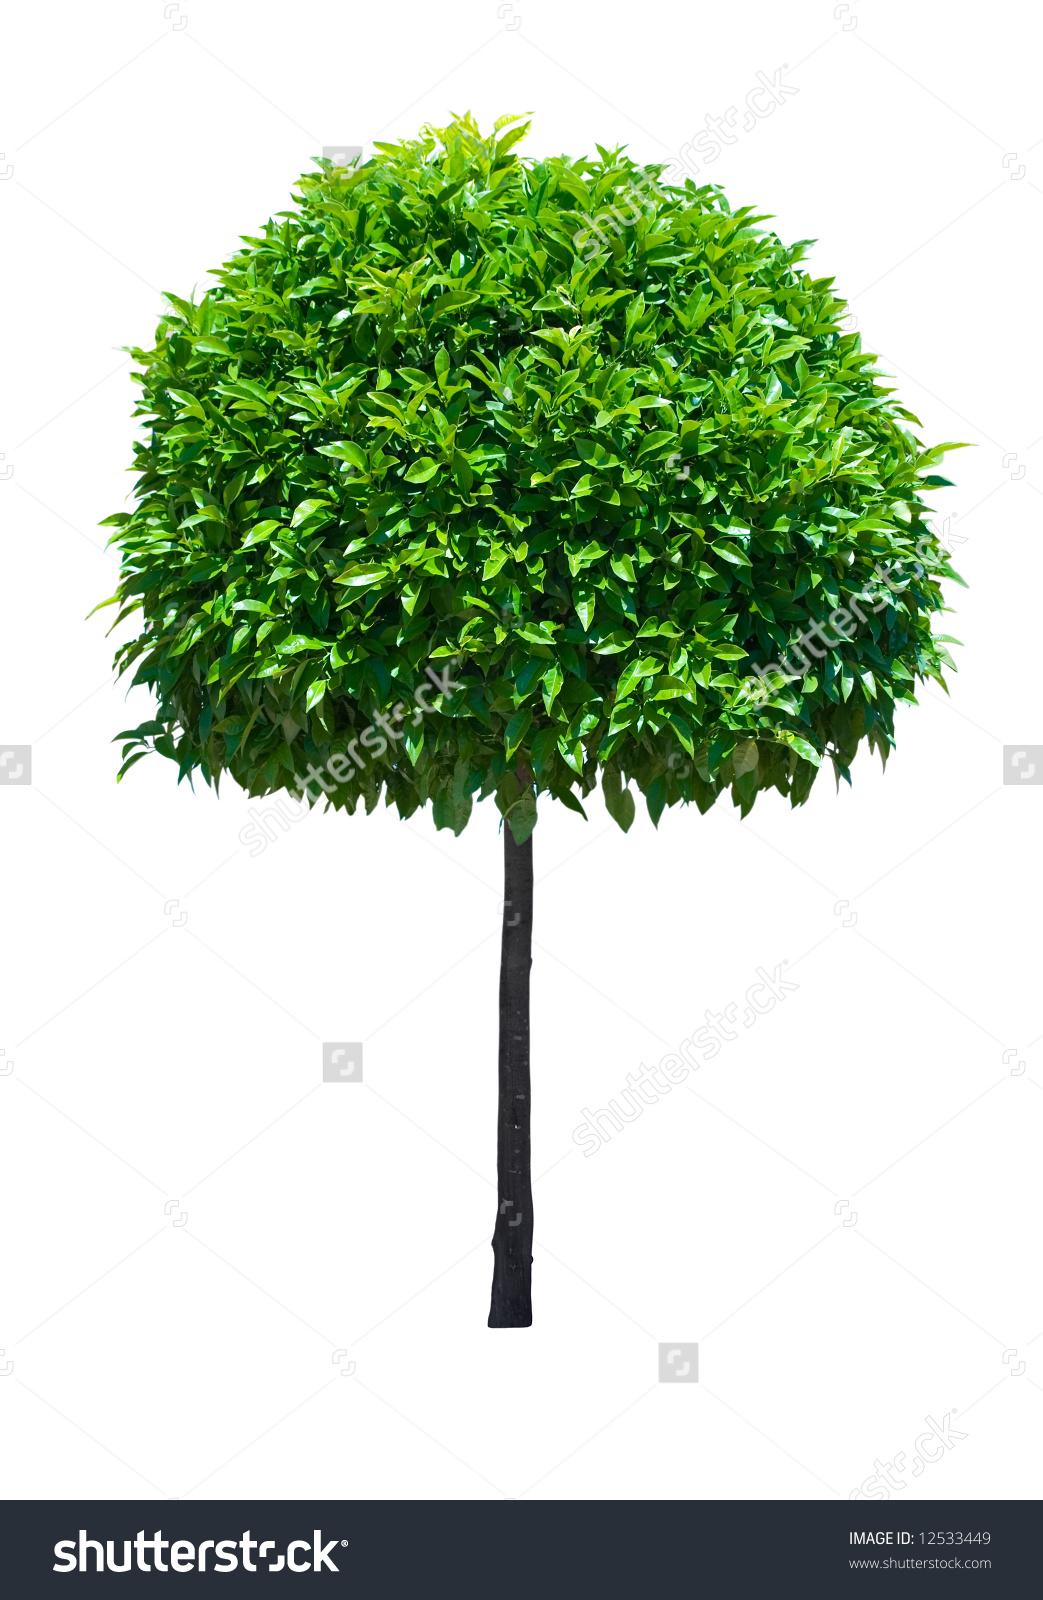 Ornamental Broad Leaf Evergreen Tree Isolated Stock Photo 12533449.